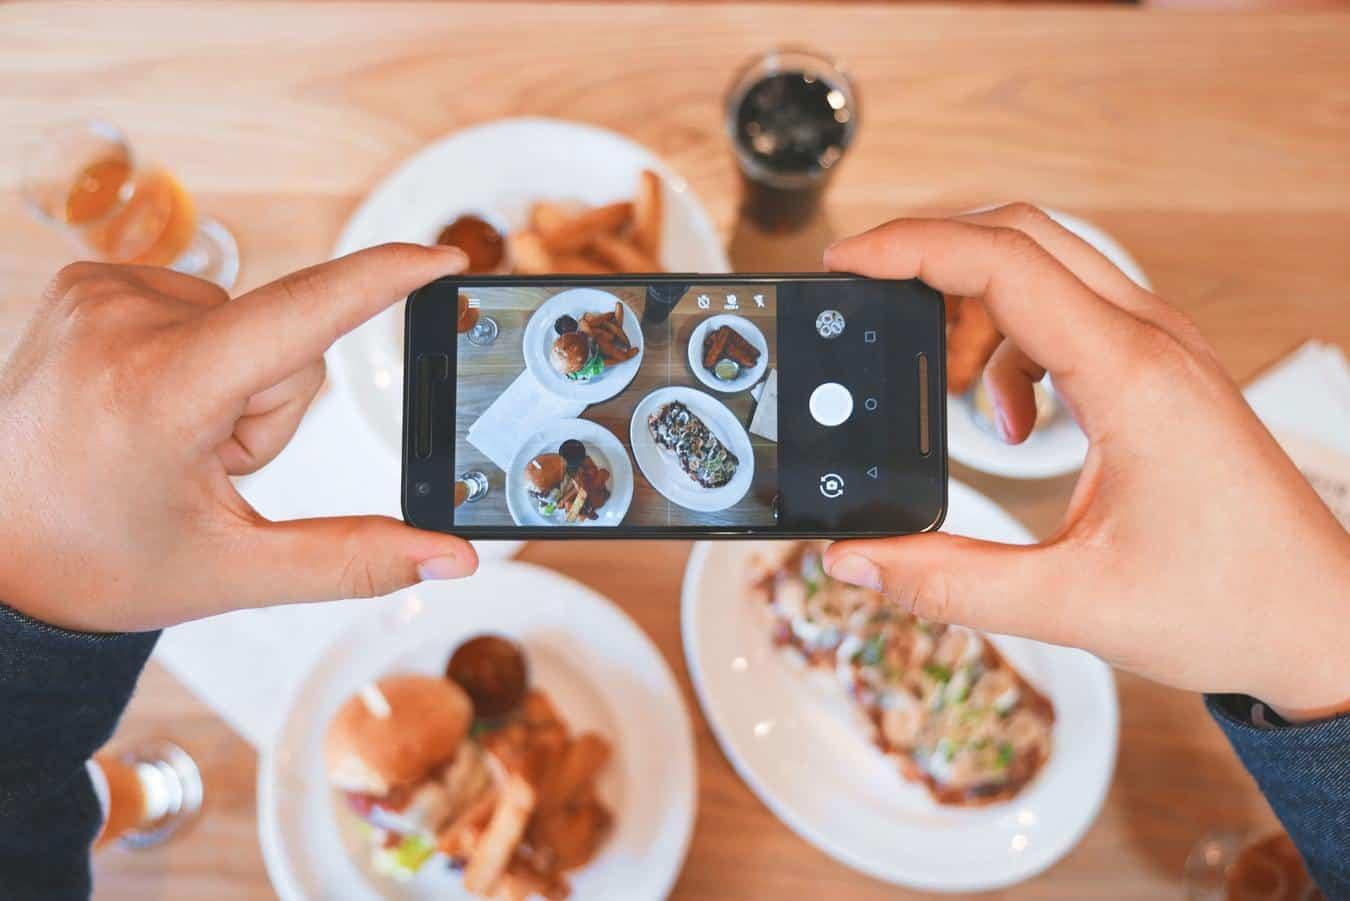 Inilah Aplikasi Pilihan Edit Gambar untuk Berjualan Online